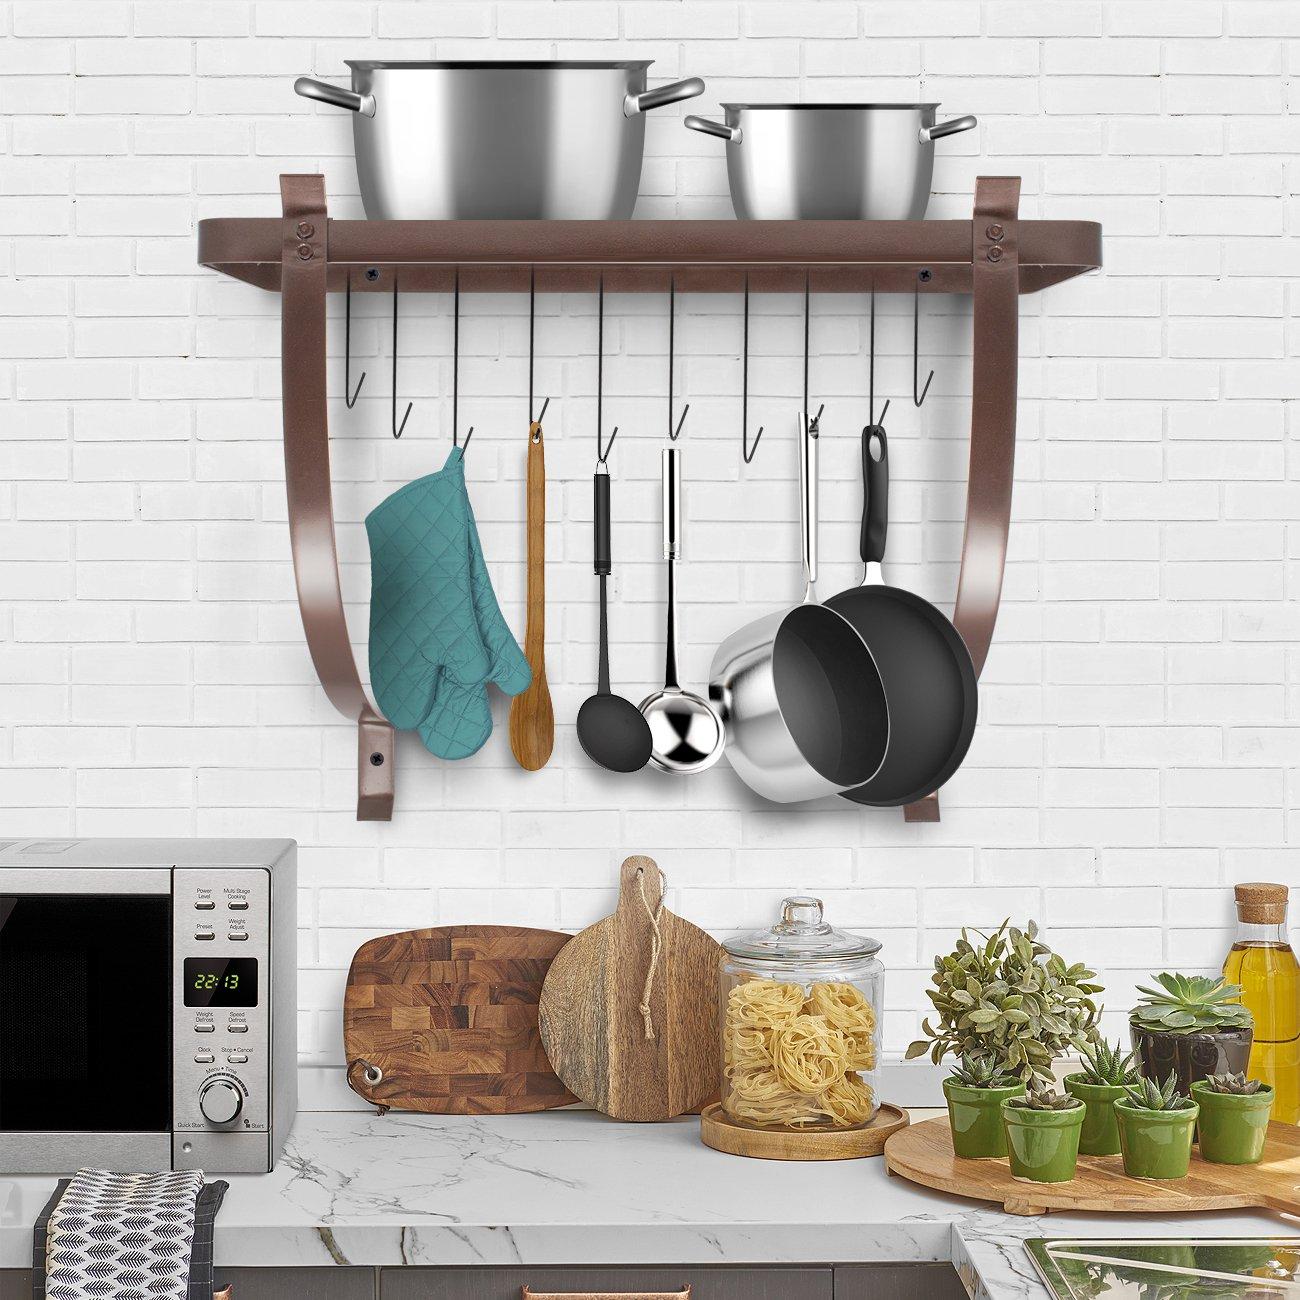 Amazon.com: Sorbus Kitchen Wall Pot Rack with Hooks - Decorative ...